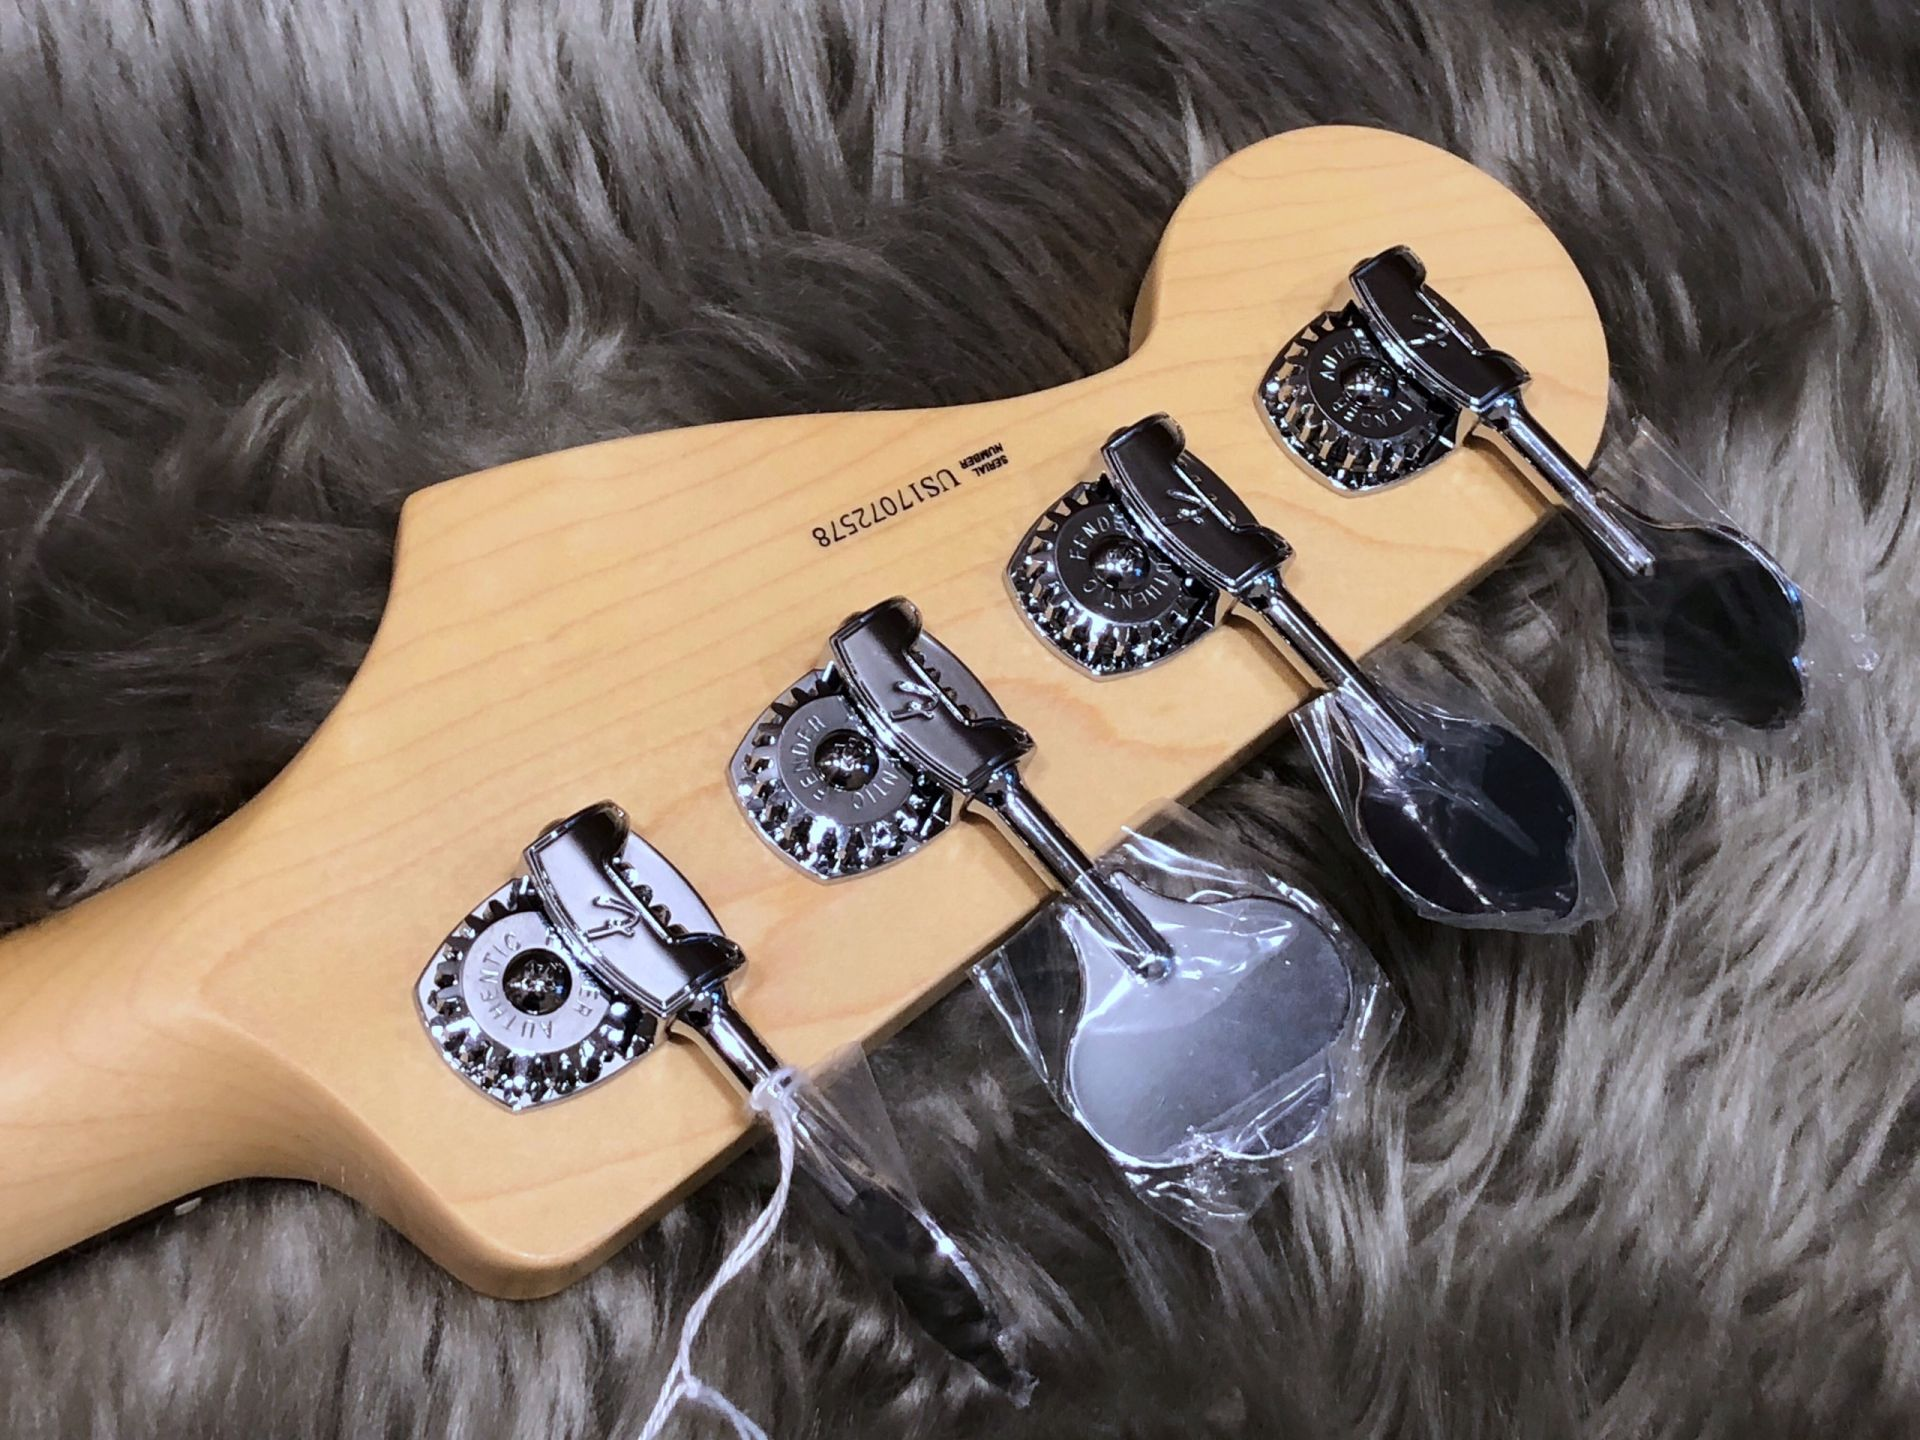 American Professional Jazz Bassのヘッド裏-アップ画像